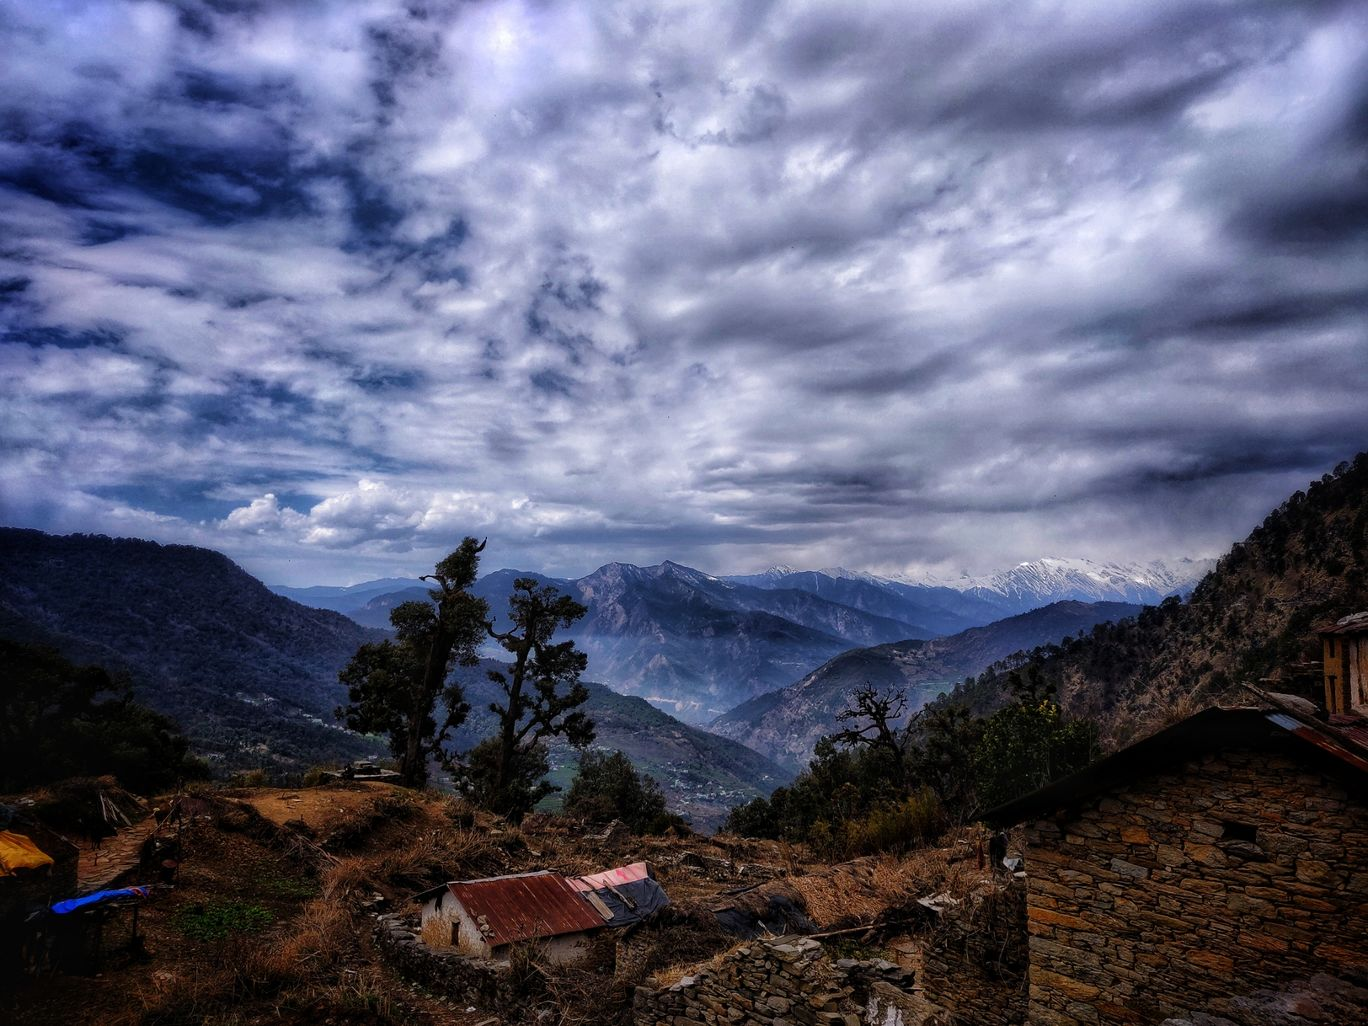 Photo of Chopta By abhsihek sahlot